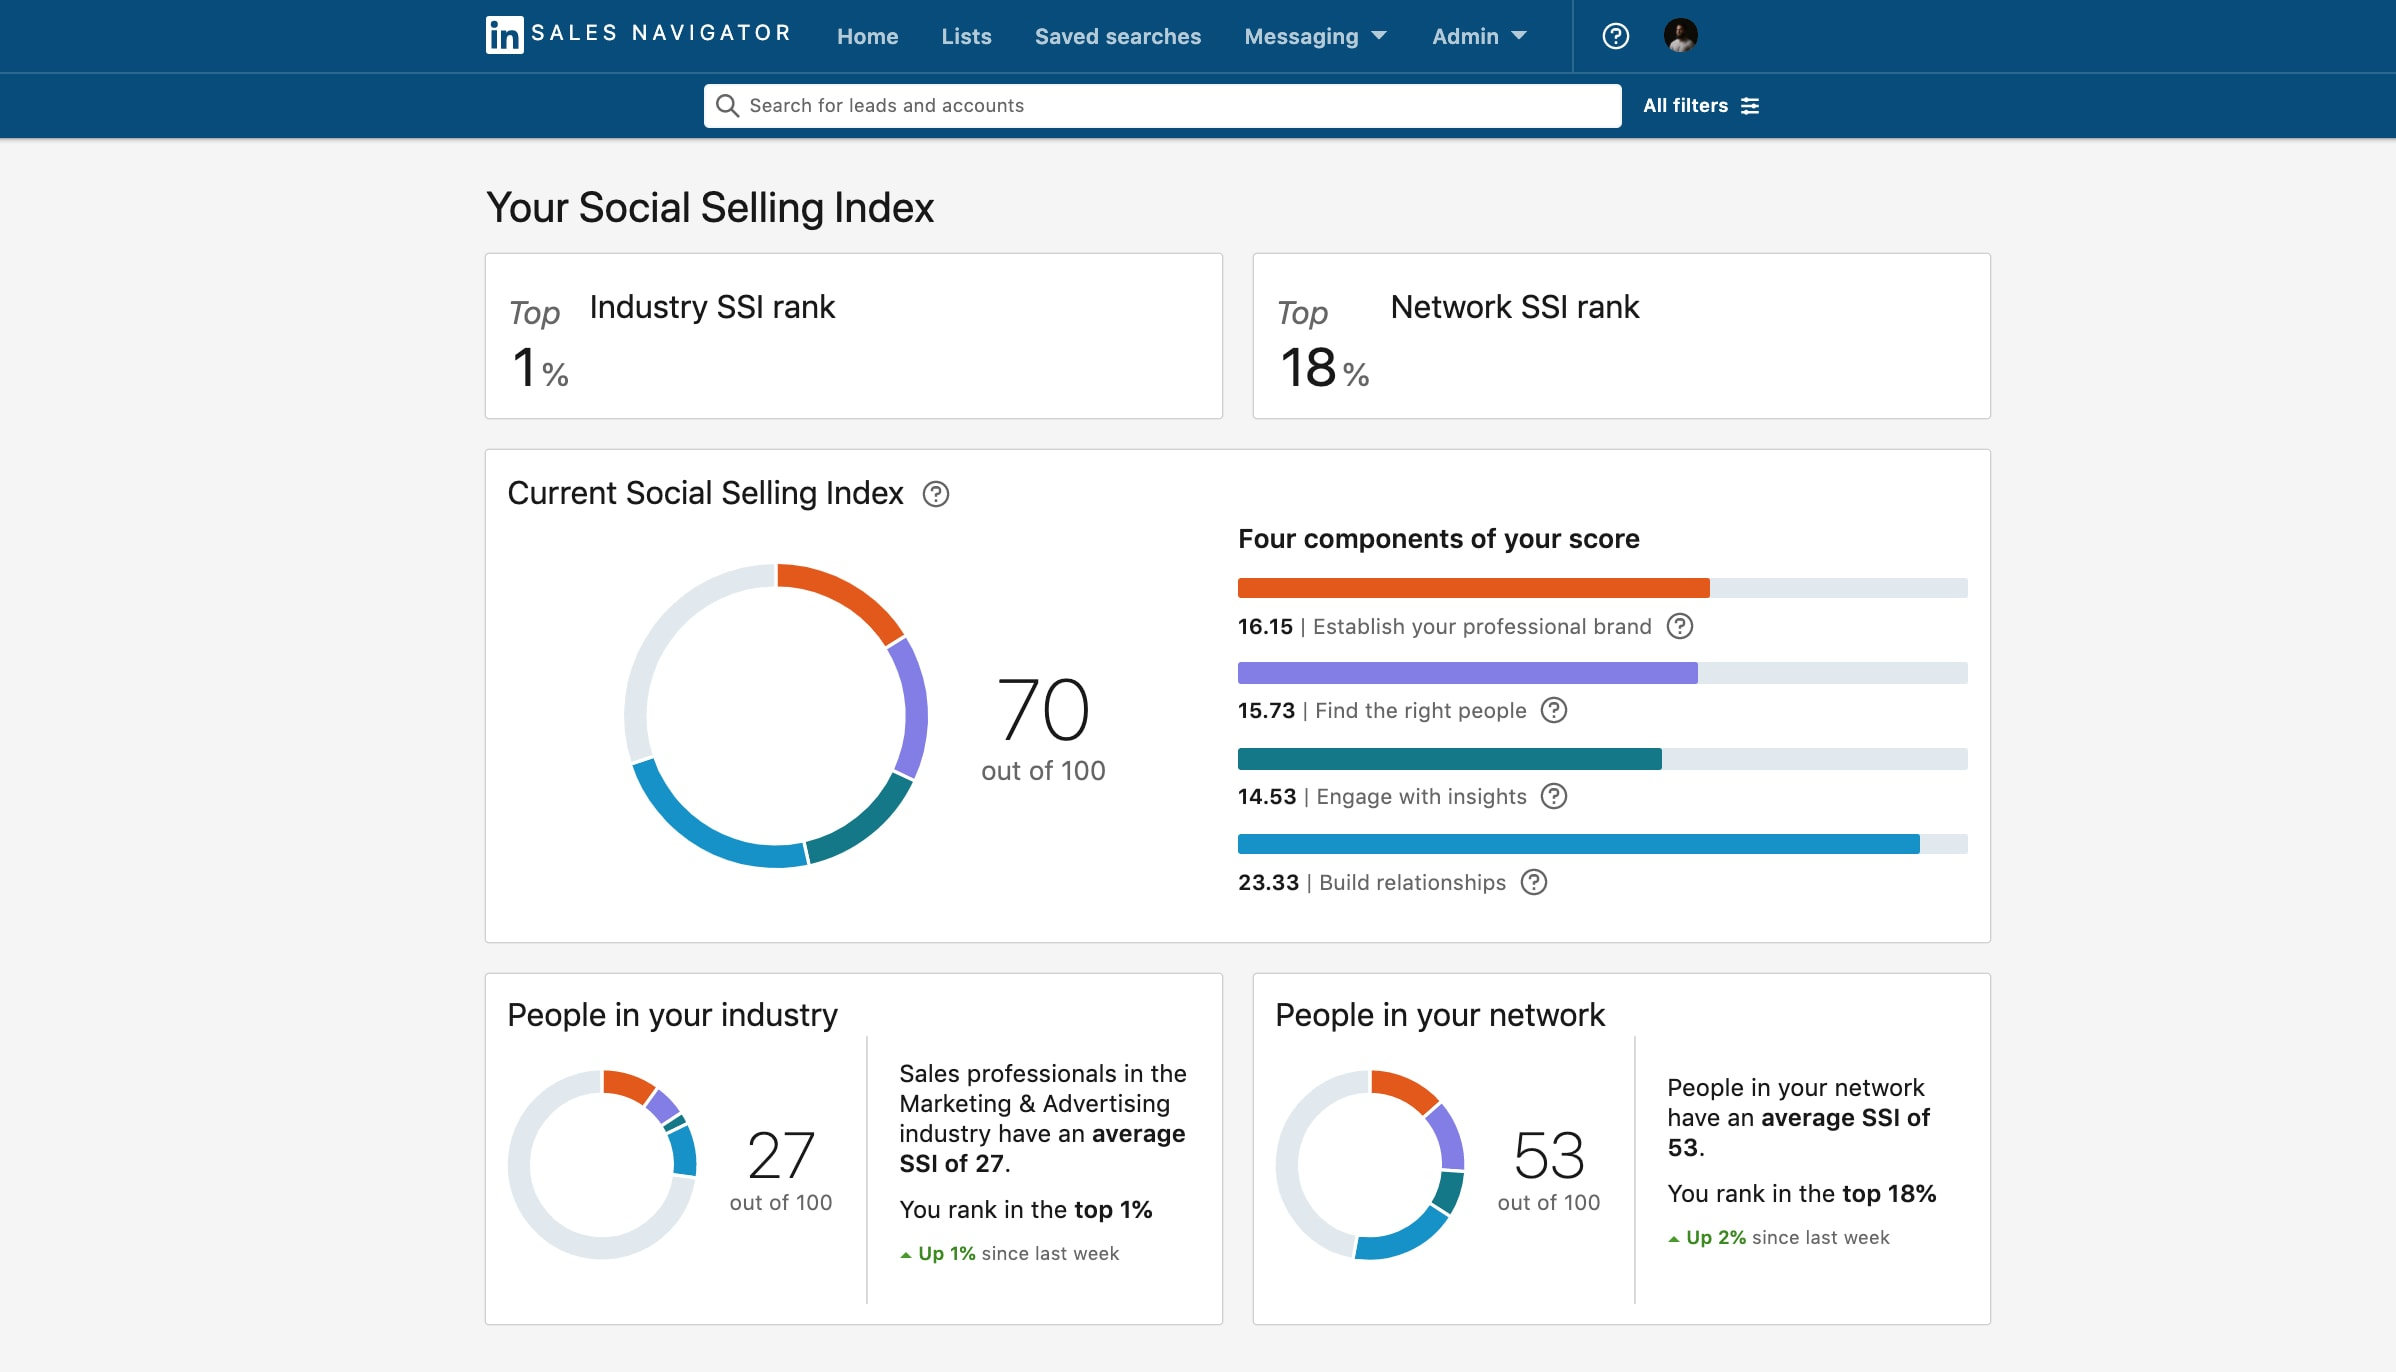 LinkedIn's social selling dashboard